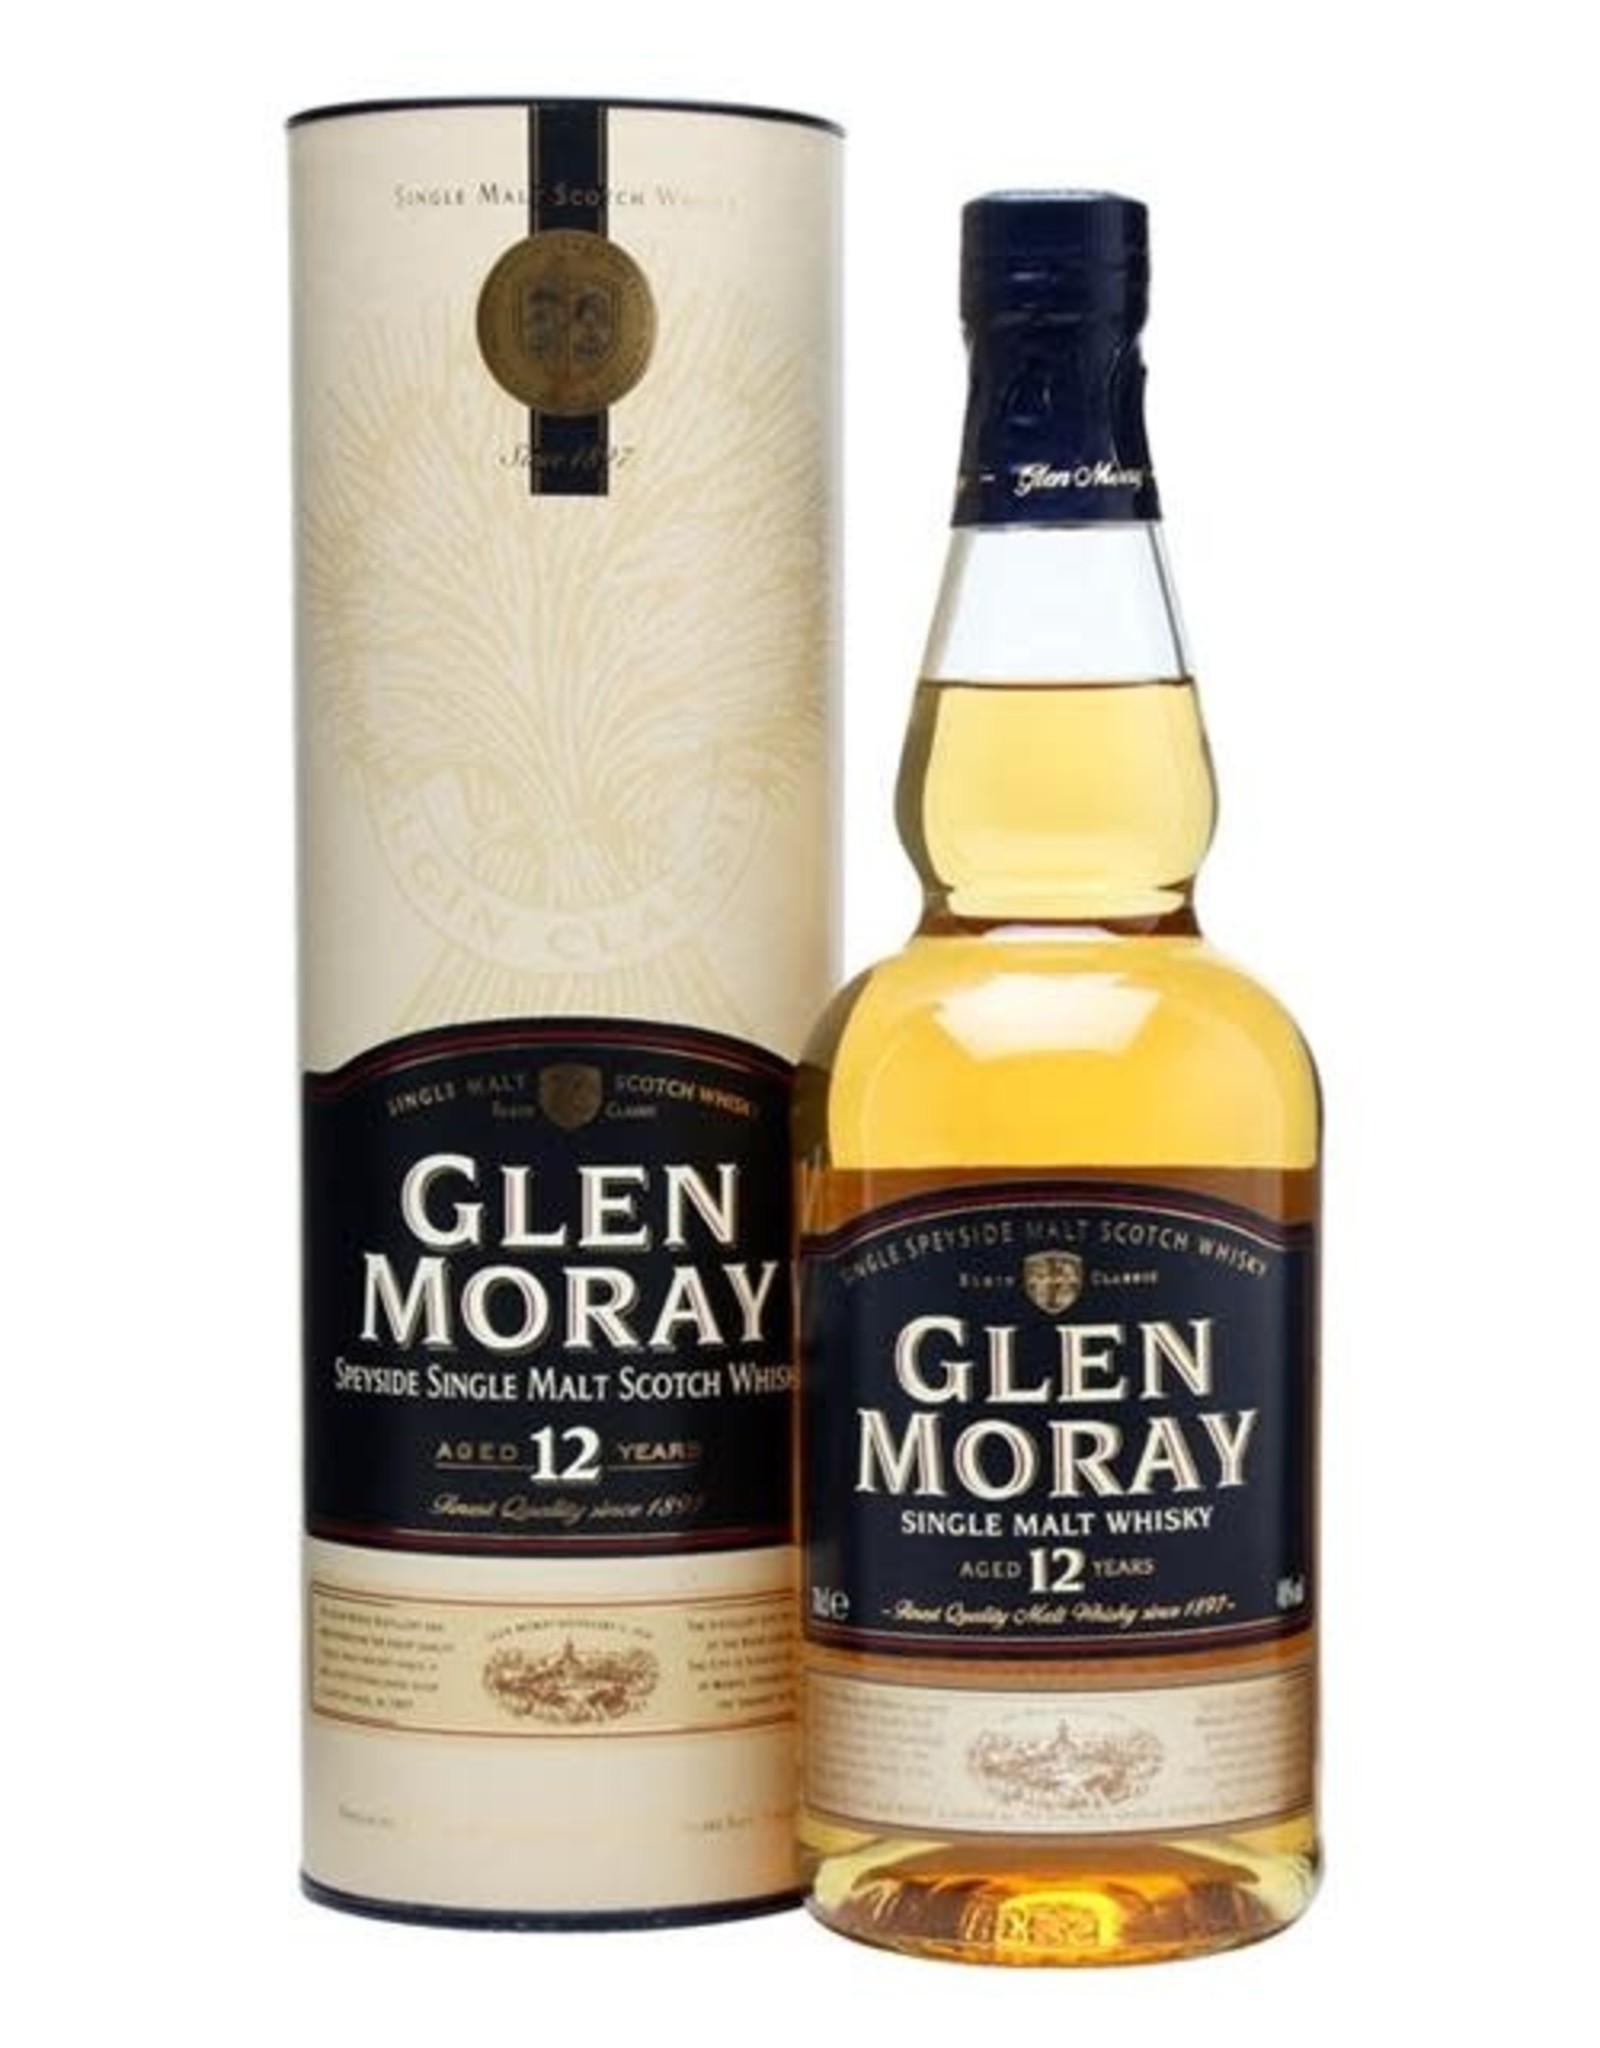 GLEN MORAY 12YR SINGLE MALT 750ML